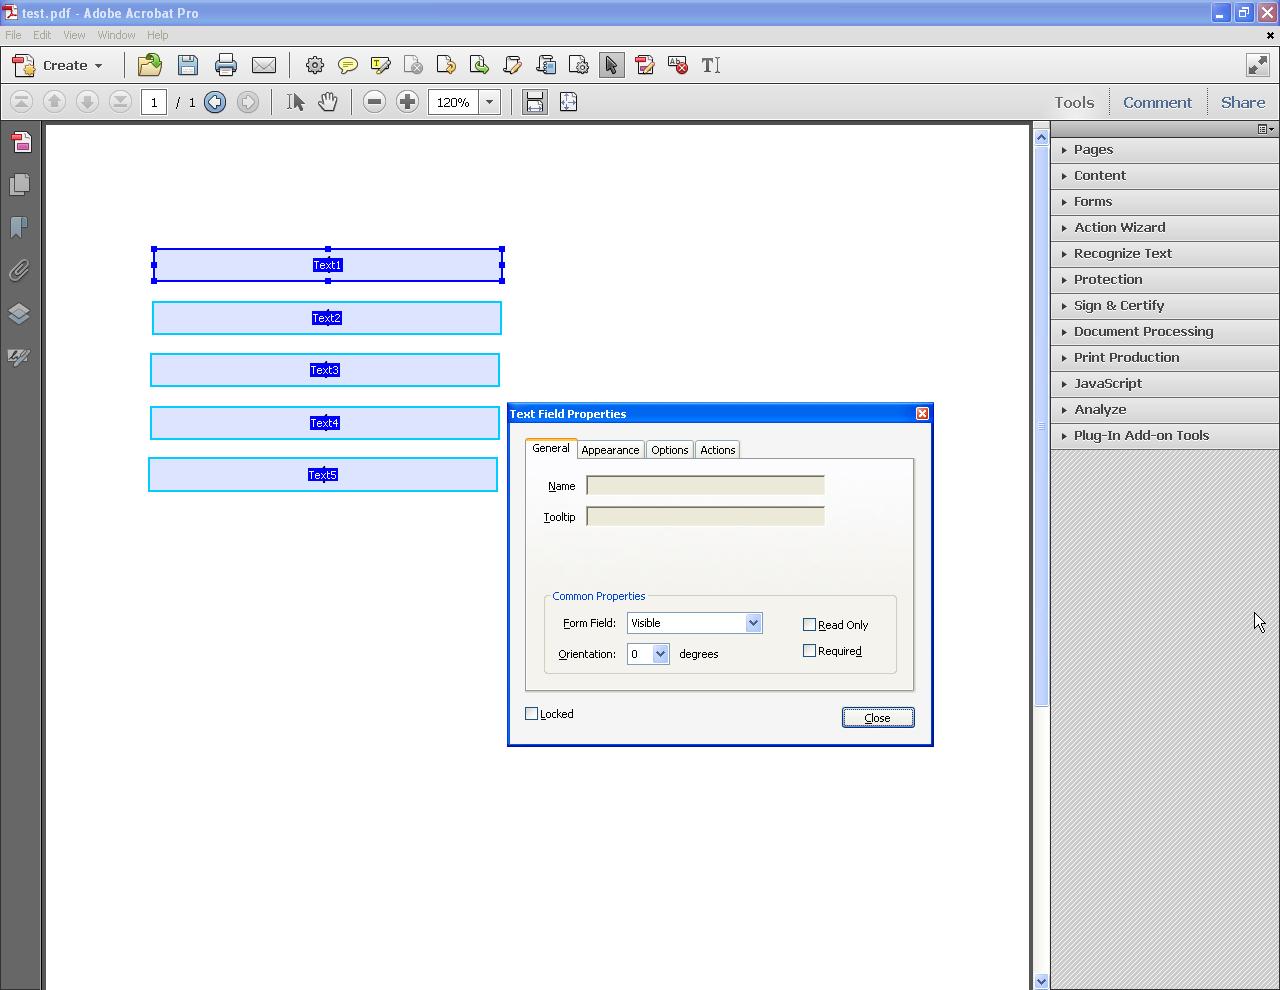 Custom-made Adobe Scripts: 2012